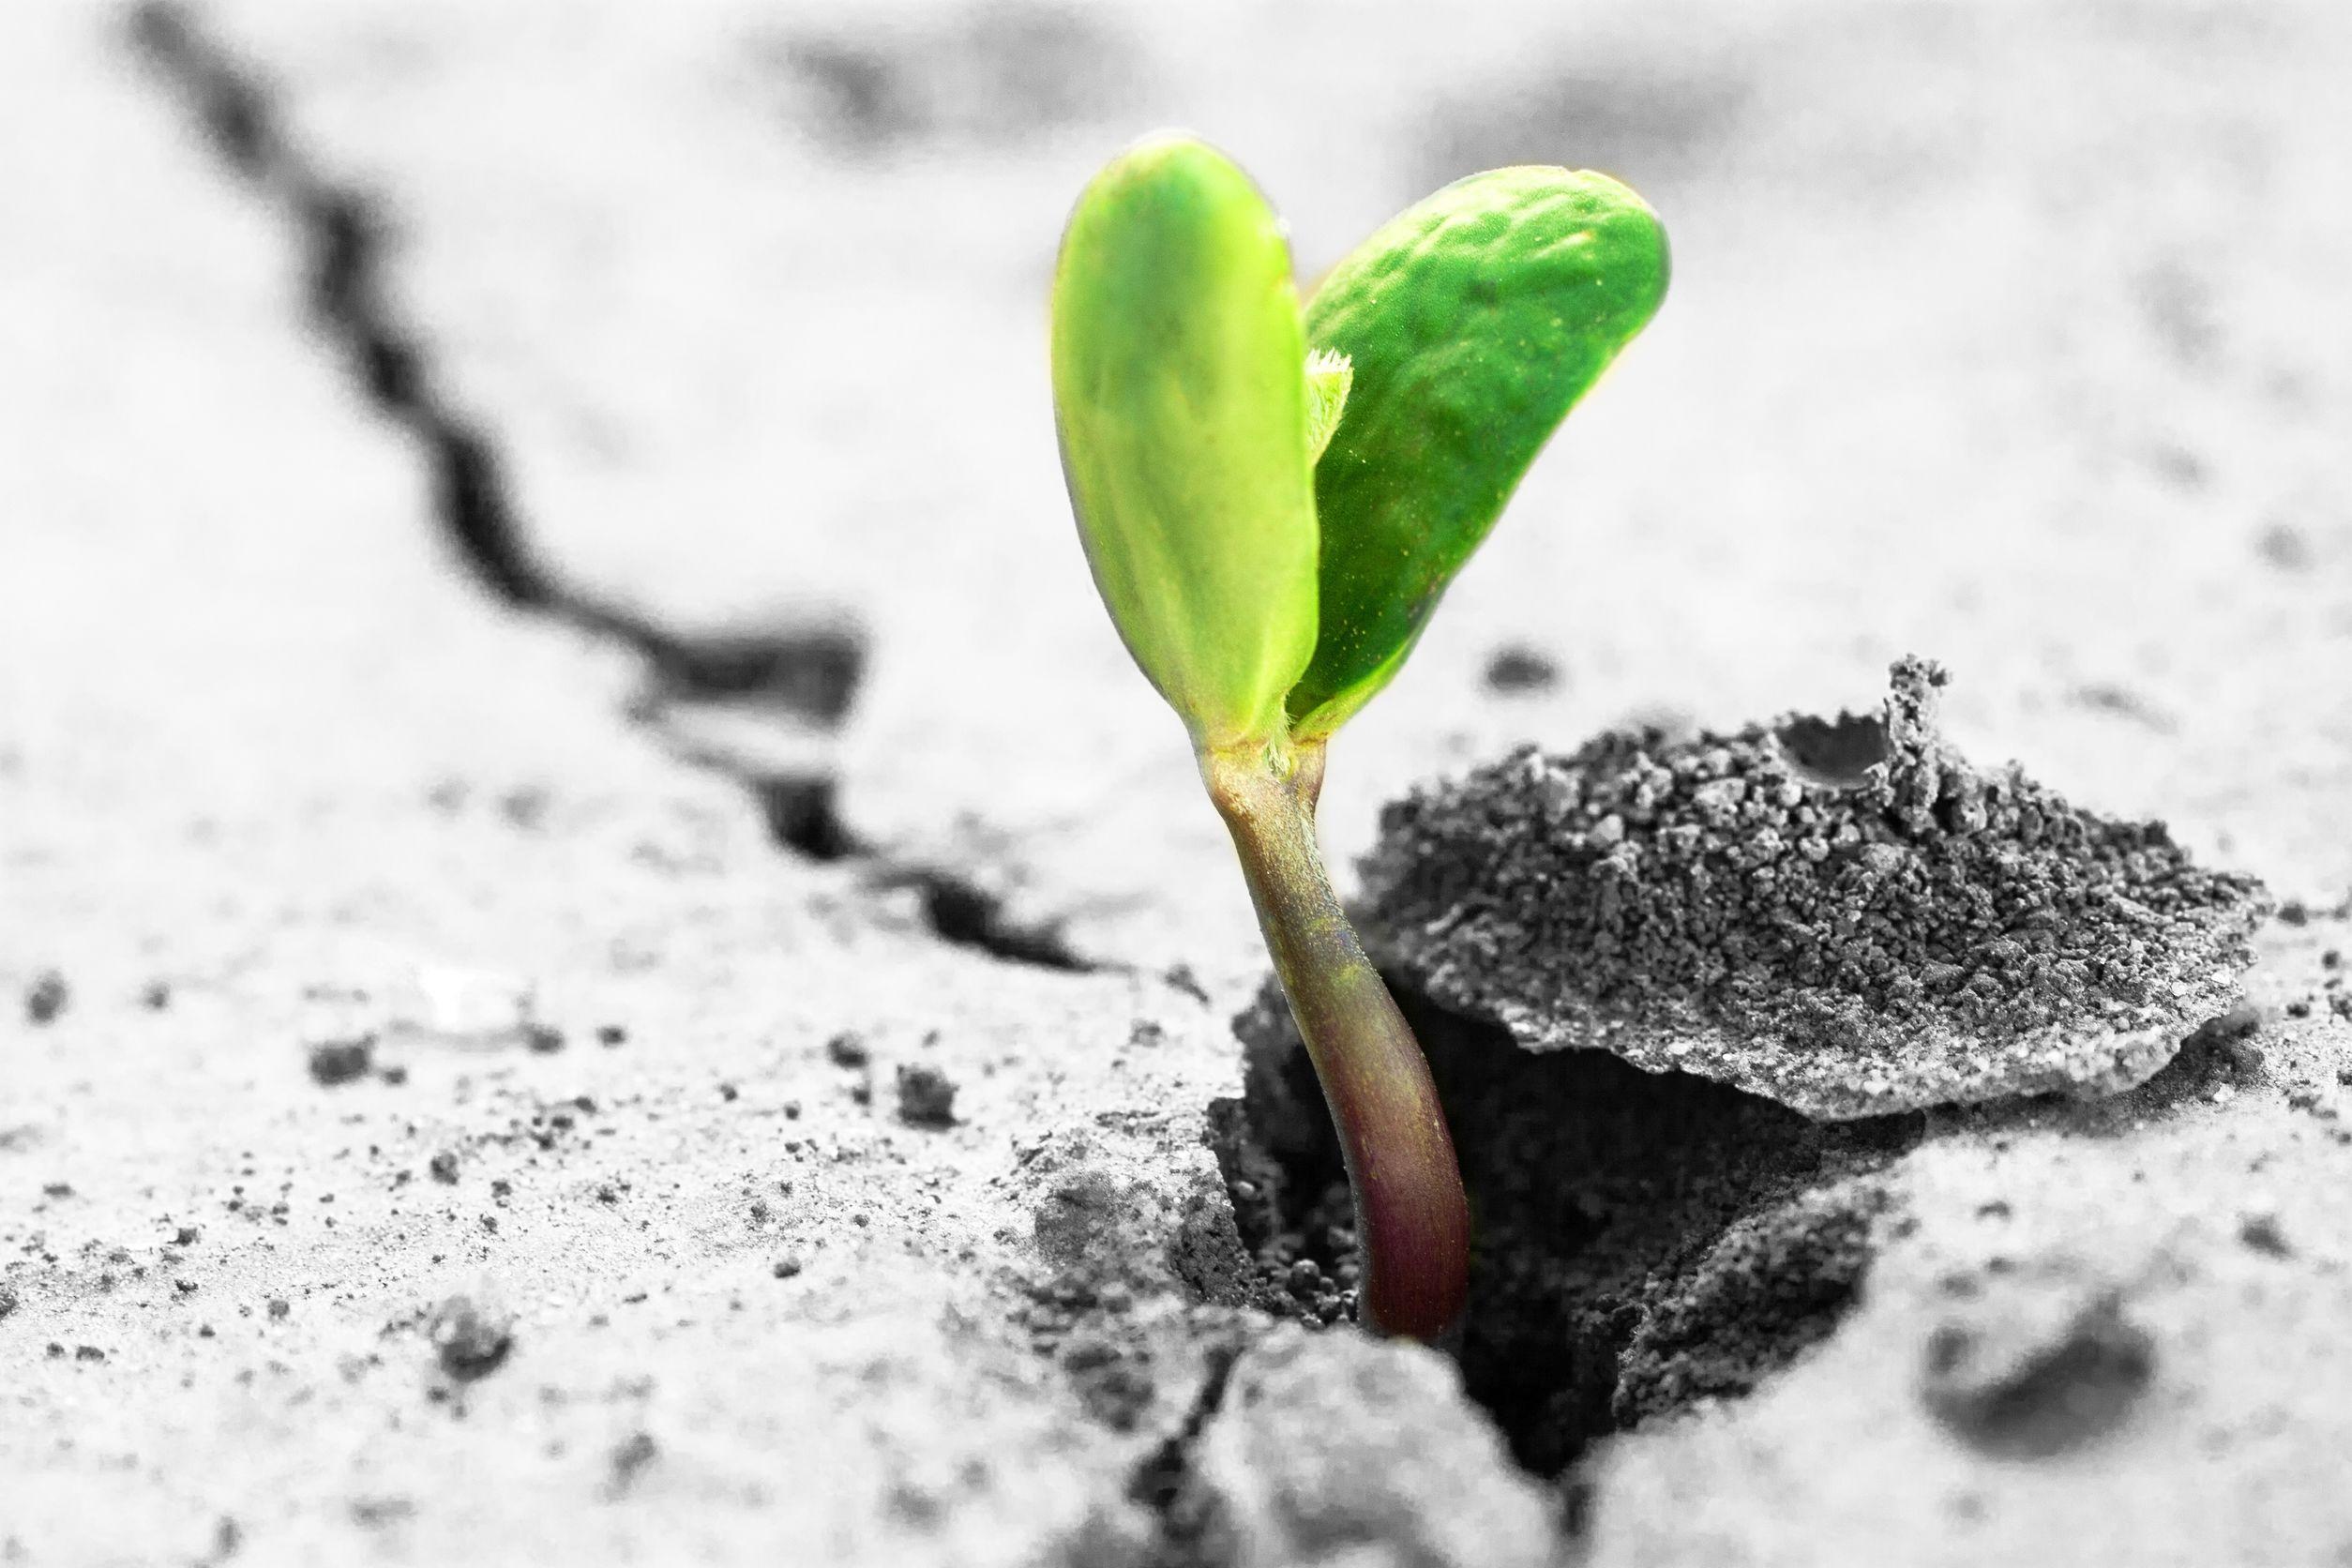 Broto de planta verde nascendo de terra seca e cinza